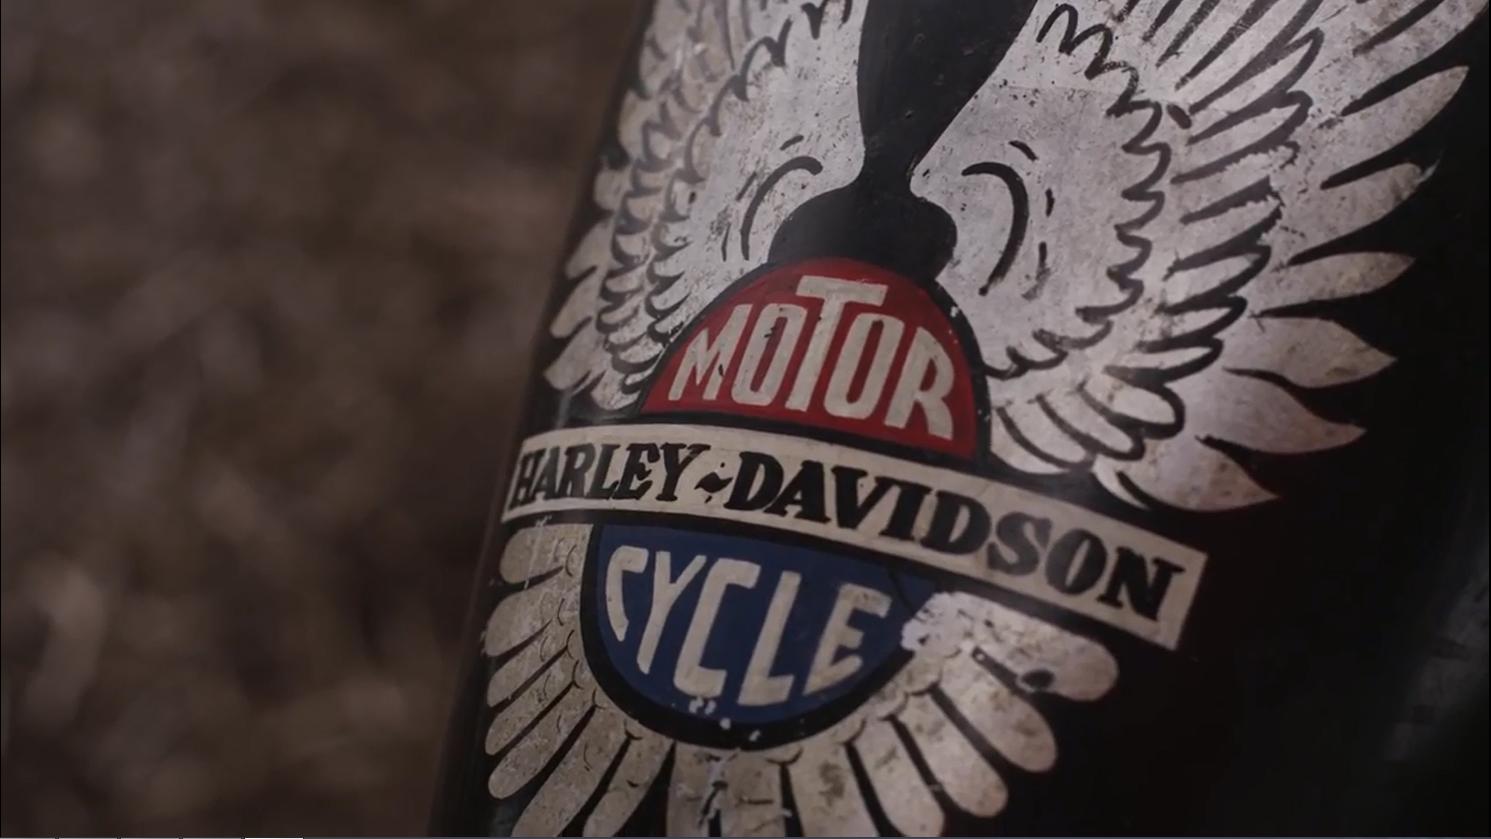 Harley Davidson motor cycle